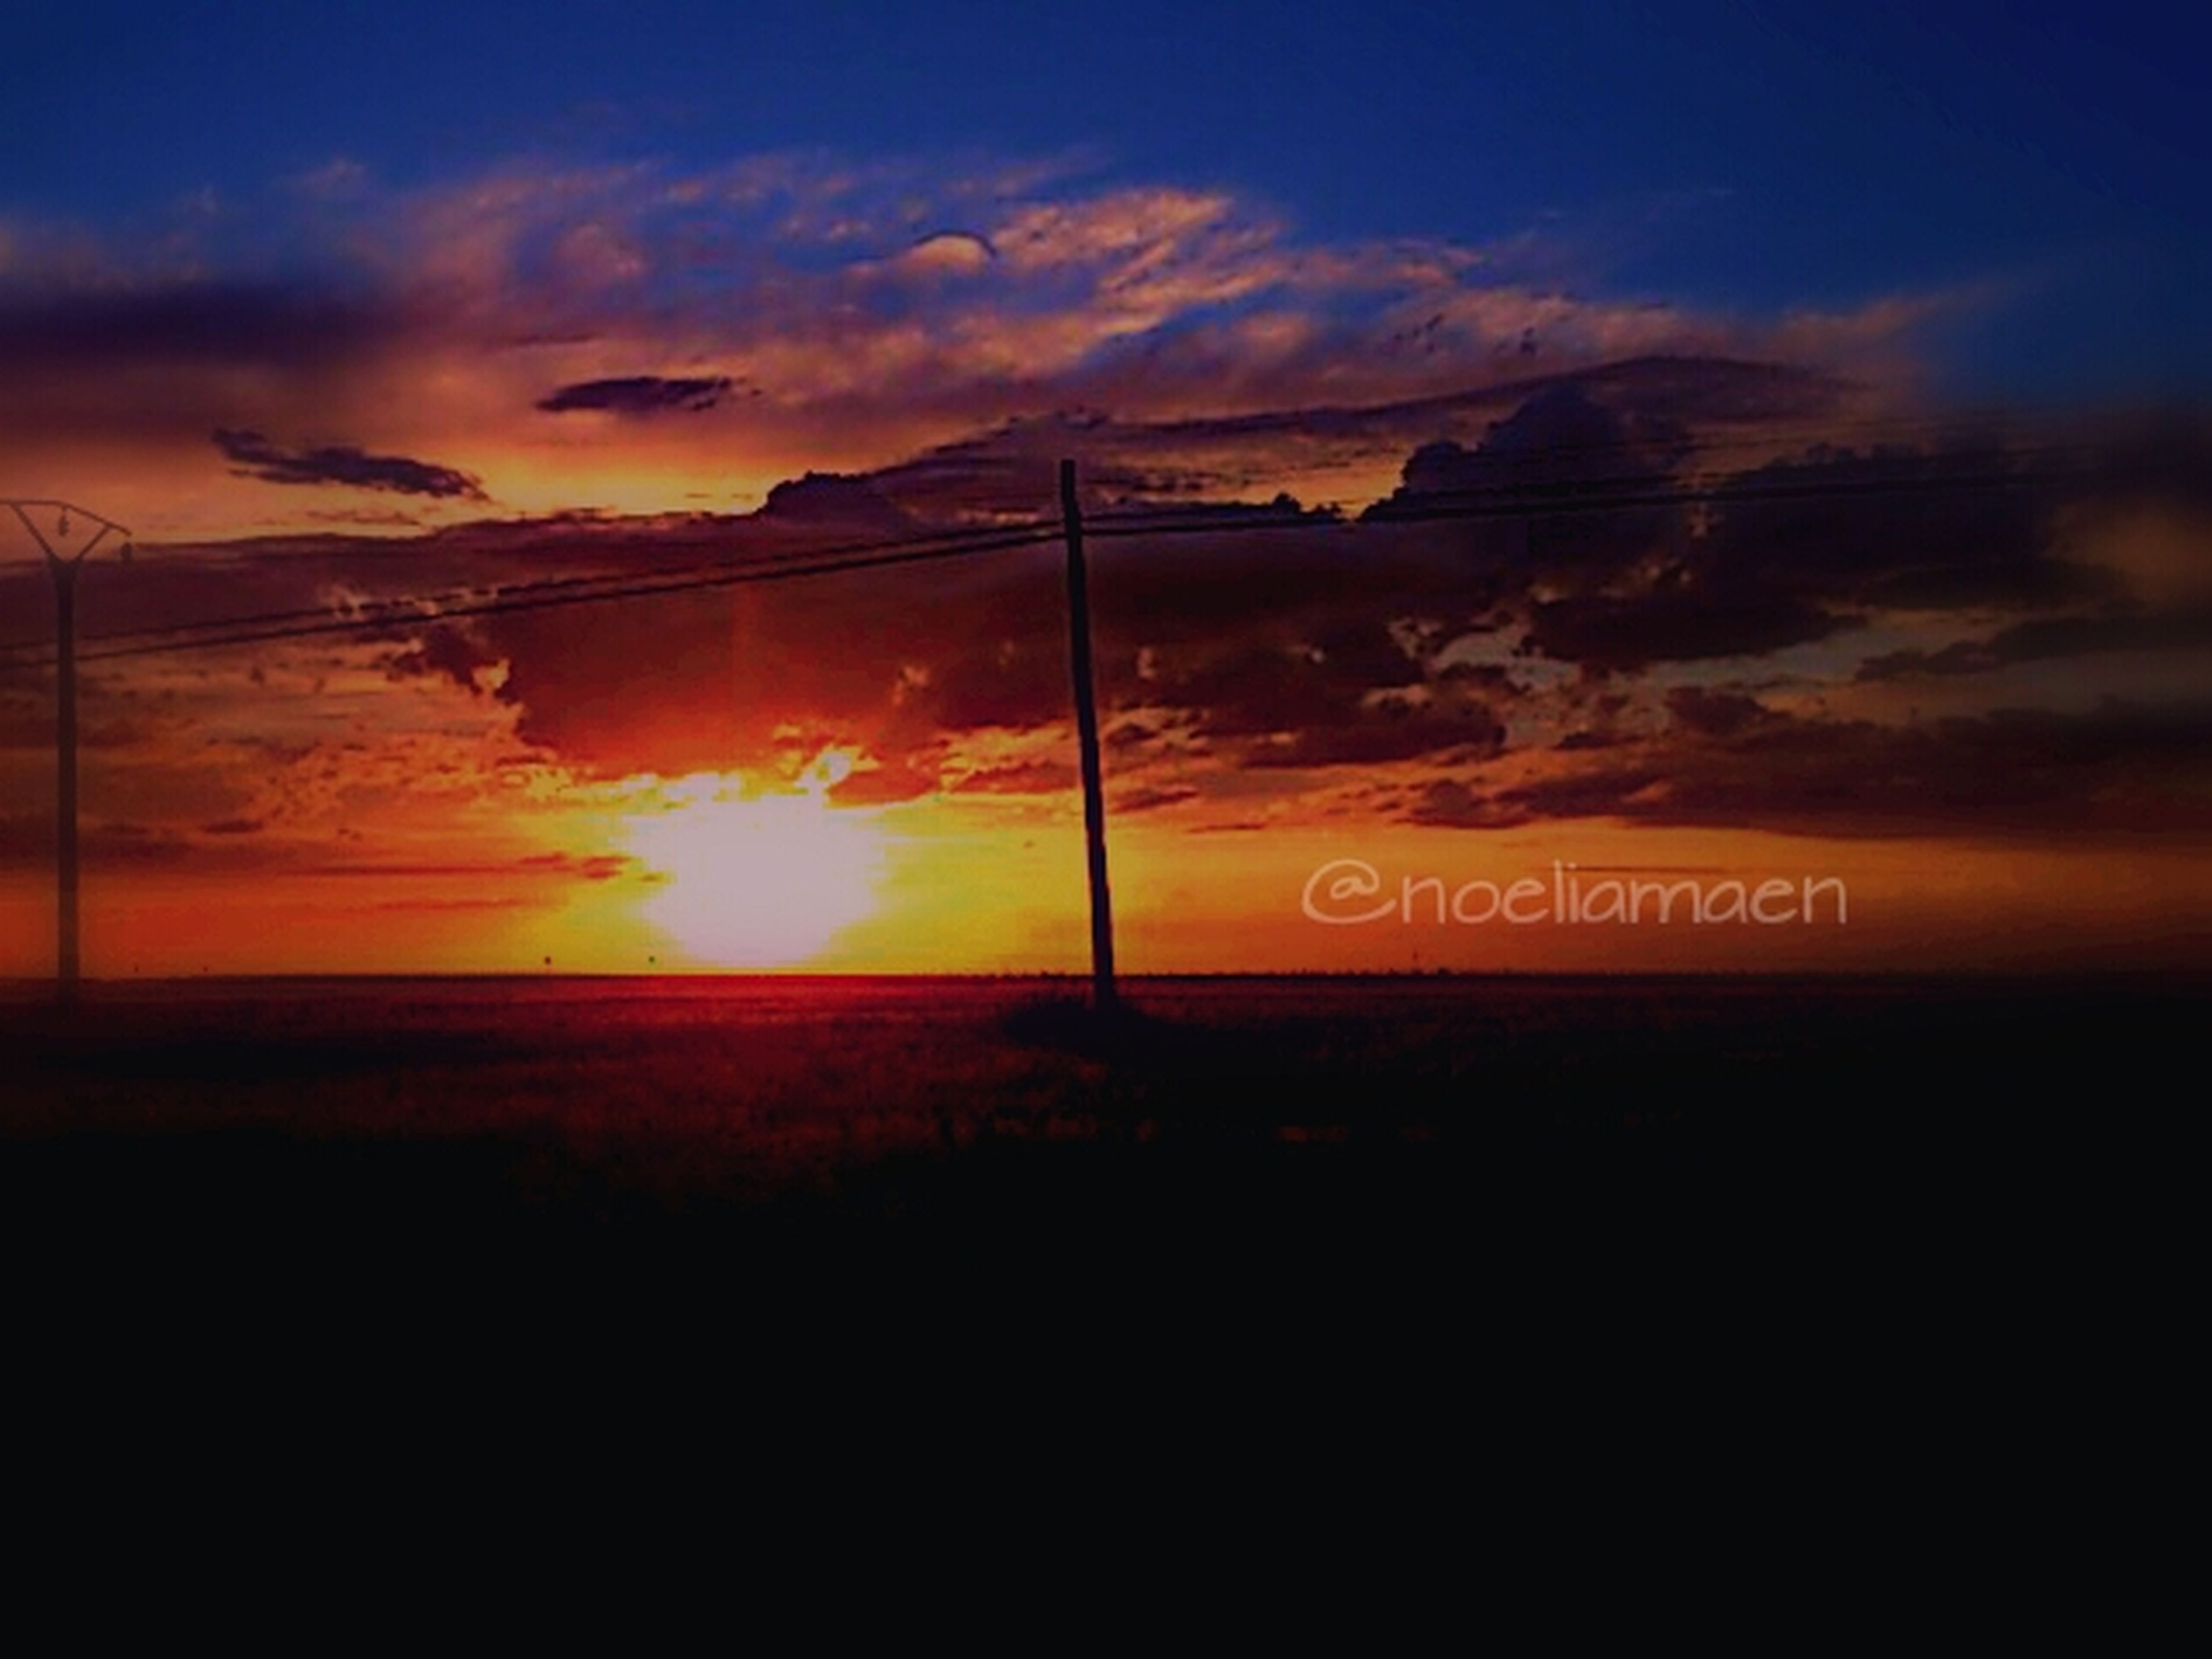 sunset, sky, cloud - sky, orange color, scenics, communication, text, silhouette, tranquility, tranquil scene, beauty in nature, landscape, western script, cloud, nature, idyllic, sun, cloudy, dramatic sky, outdoors